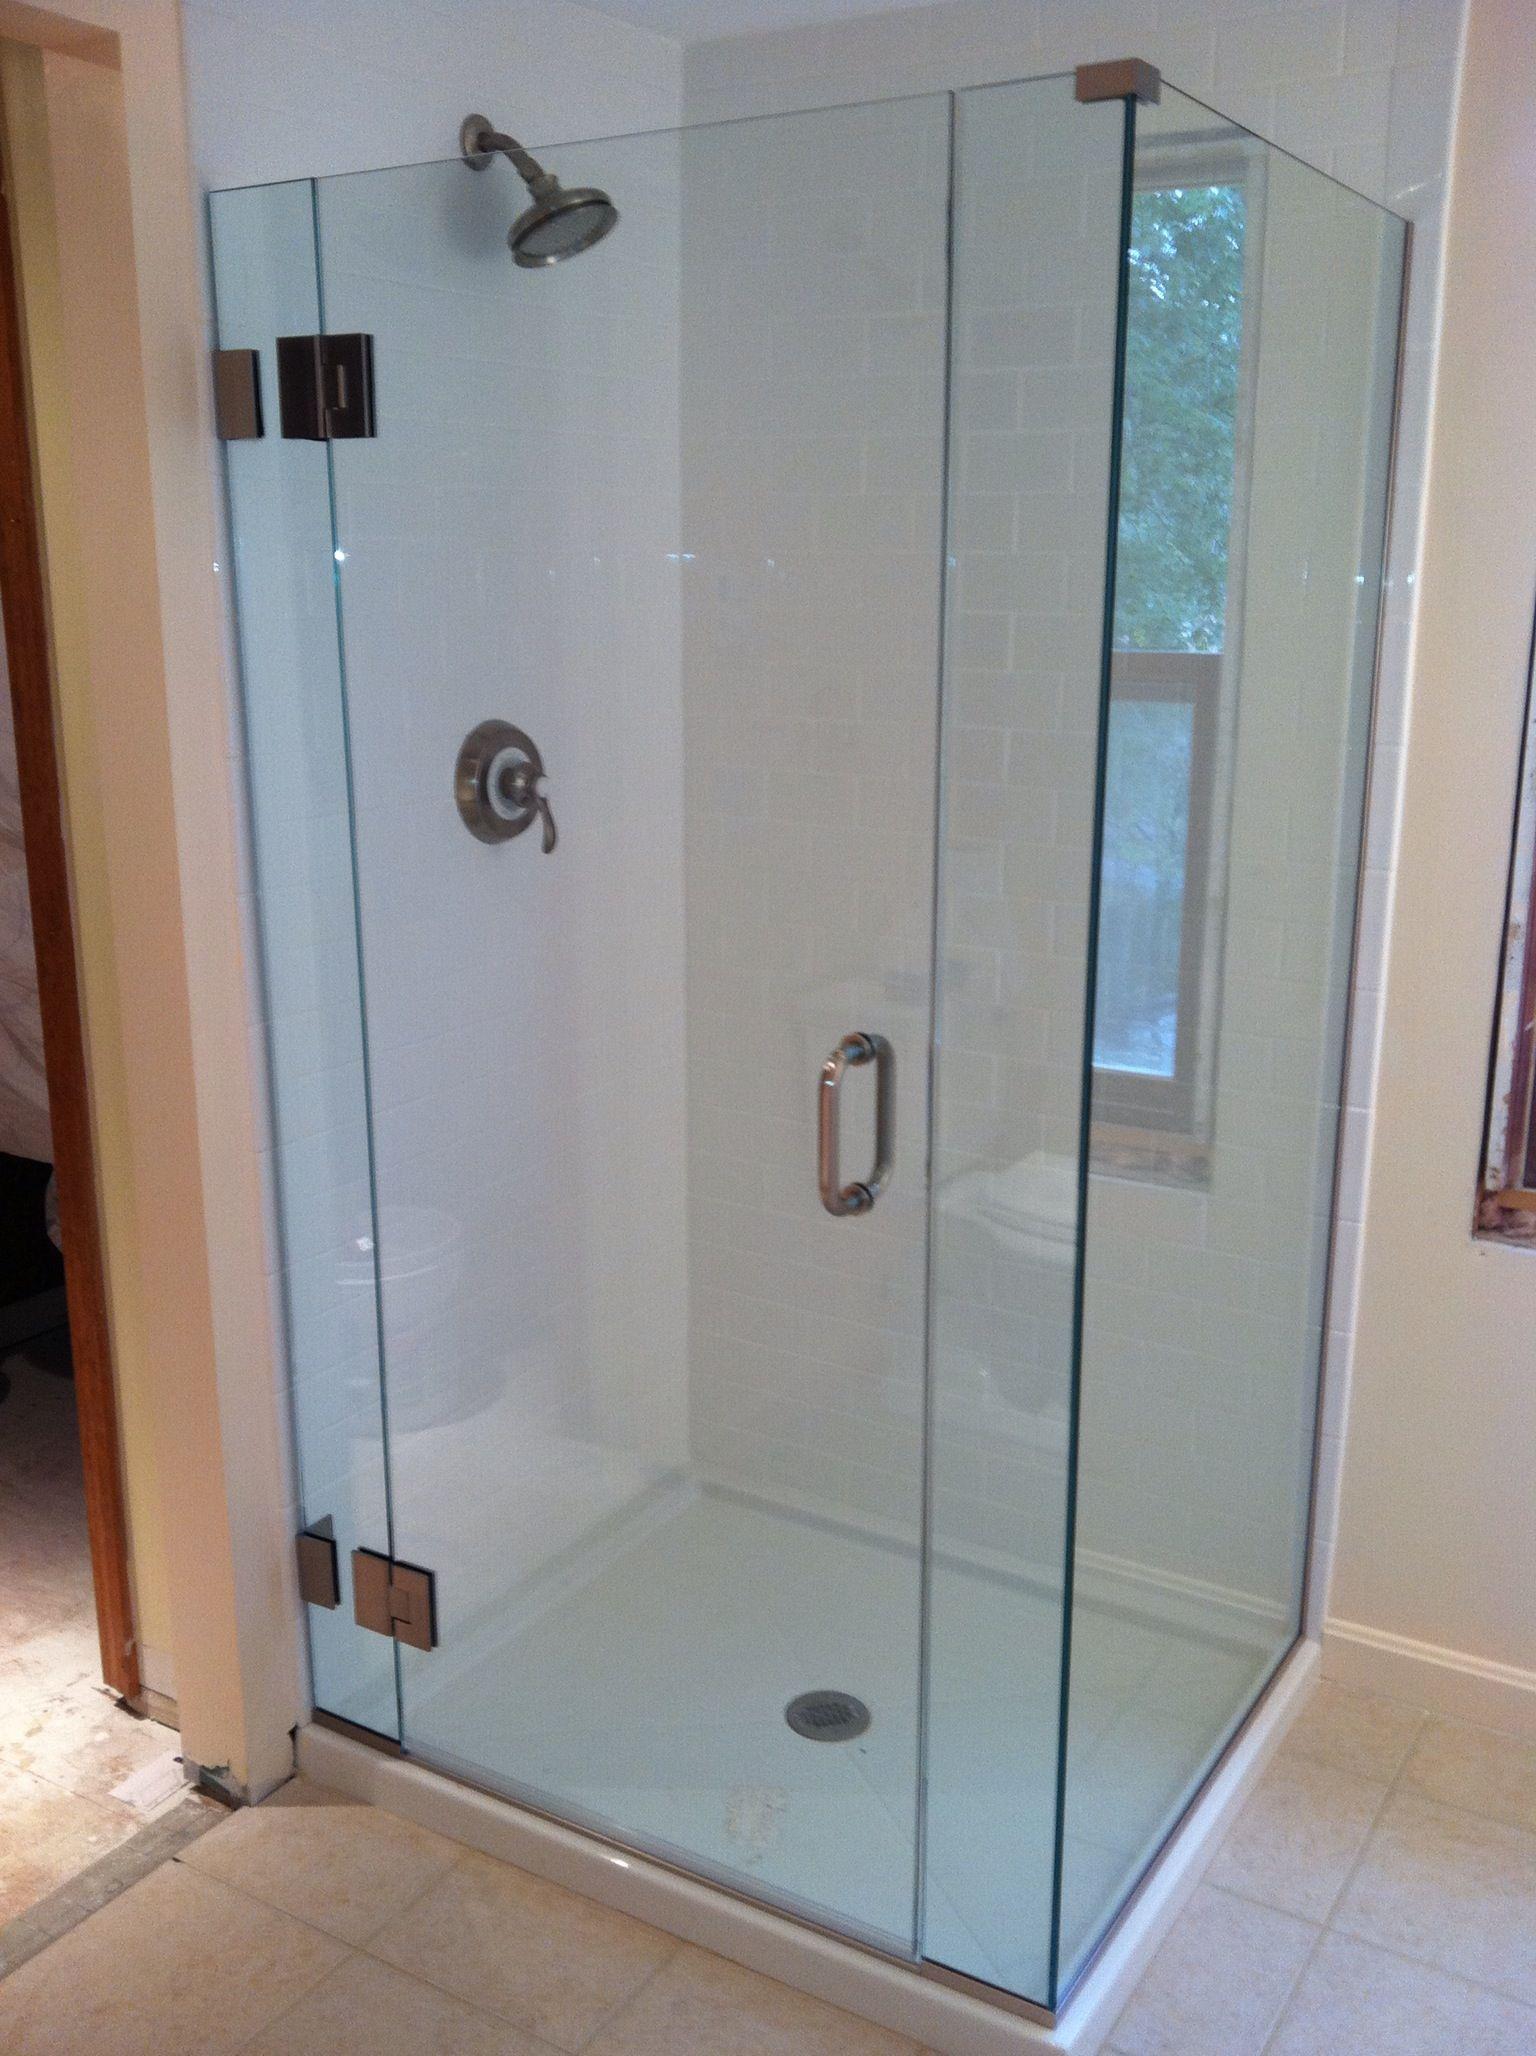 Simple glass shower | Luxury Showers | Pinterest | Shower enclosure ...